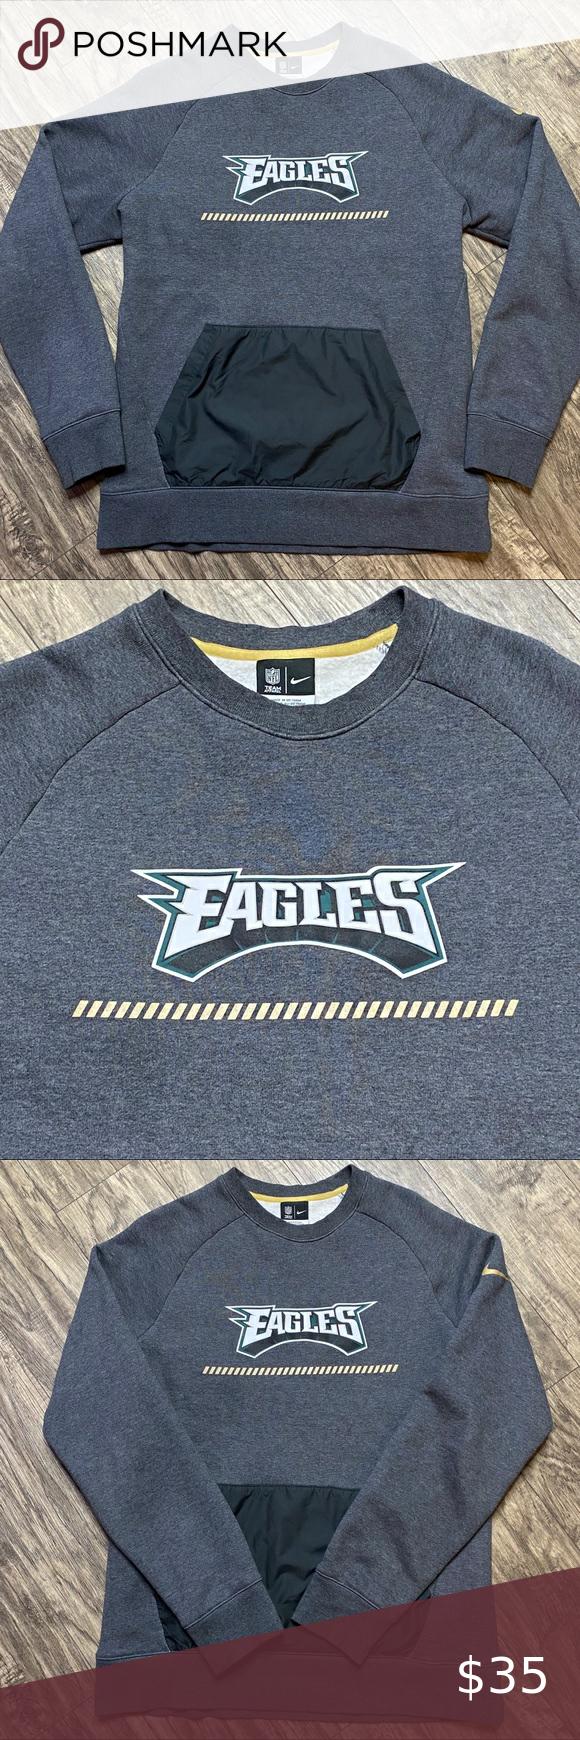 Nike Philadelphia Eagles Crewneck Sweatshirt Large Crew Neck Sweatshirt Sweatshirts Long Sleeve Tshirt Men [ 1740 x 580 Pixel ]